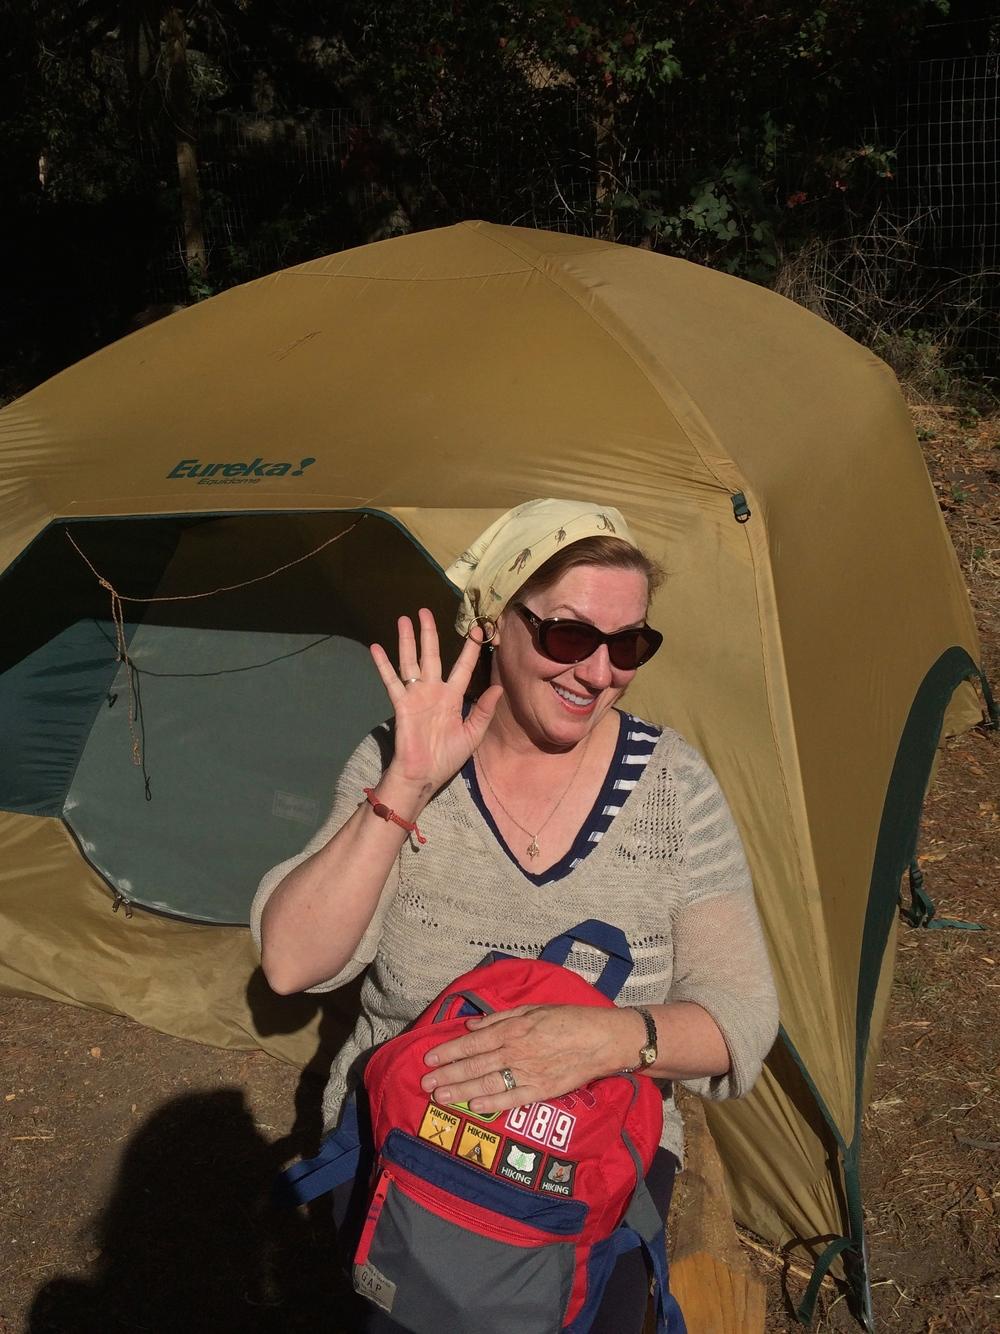 Ma wearing her special kiche kamping kerchief komplete with built-in hoop earrings. That woman.